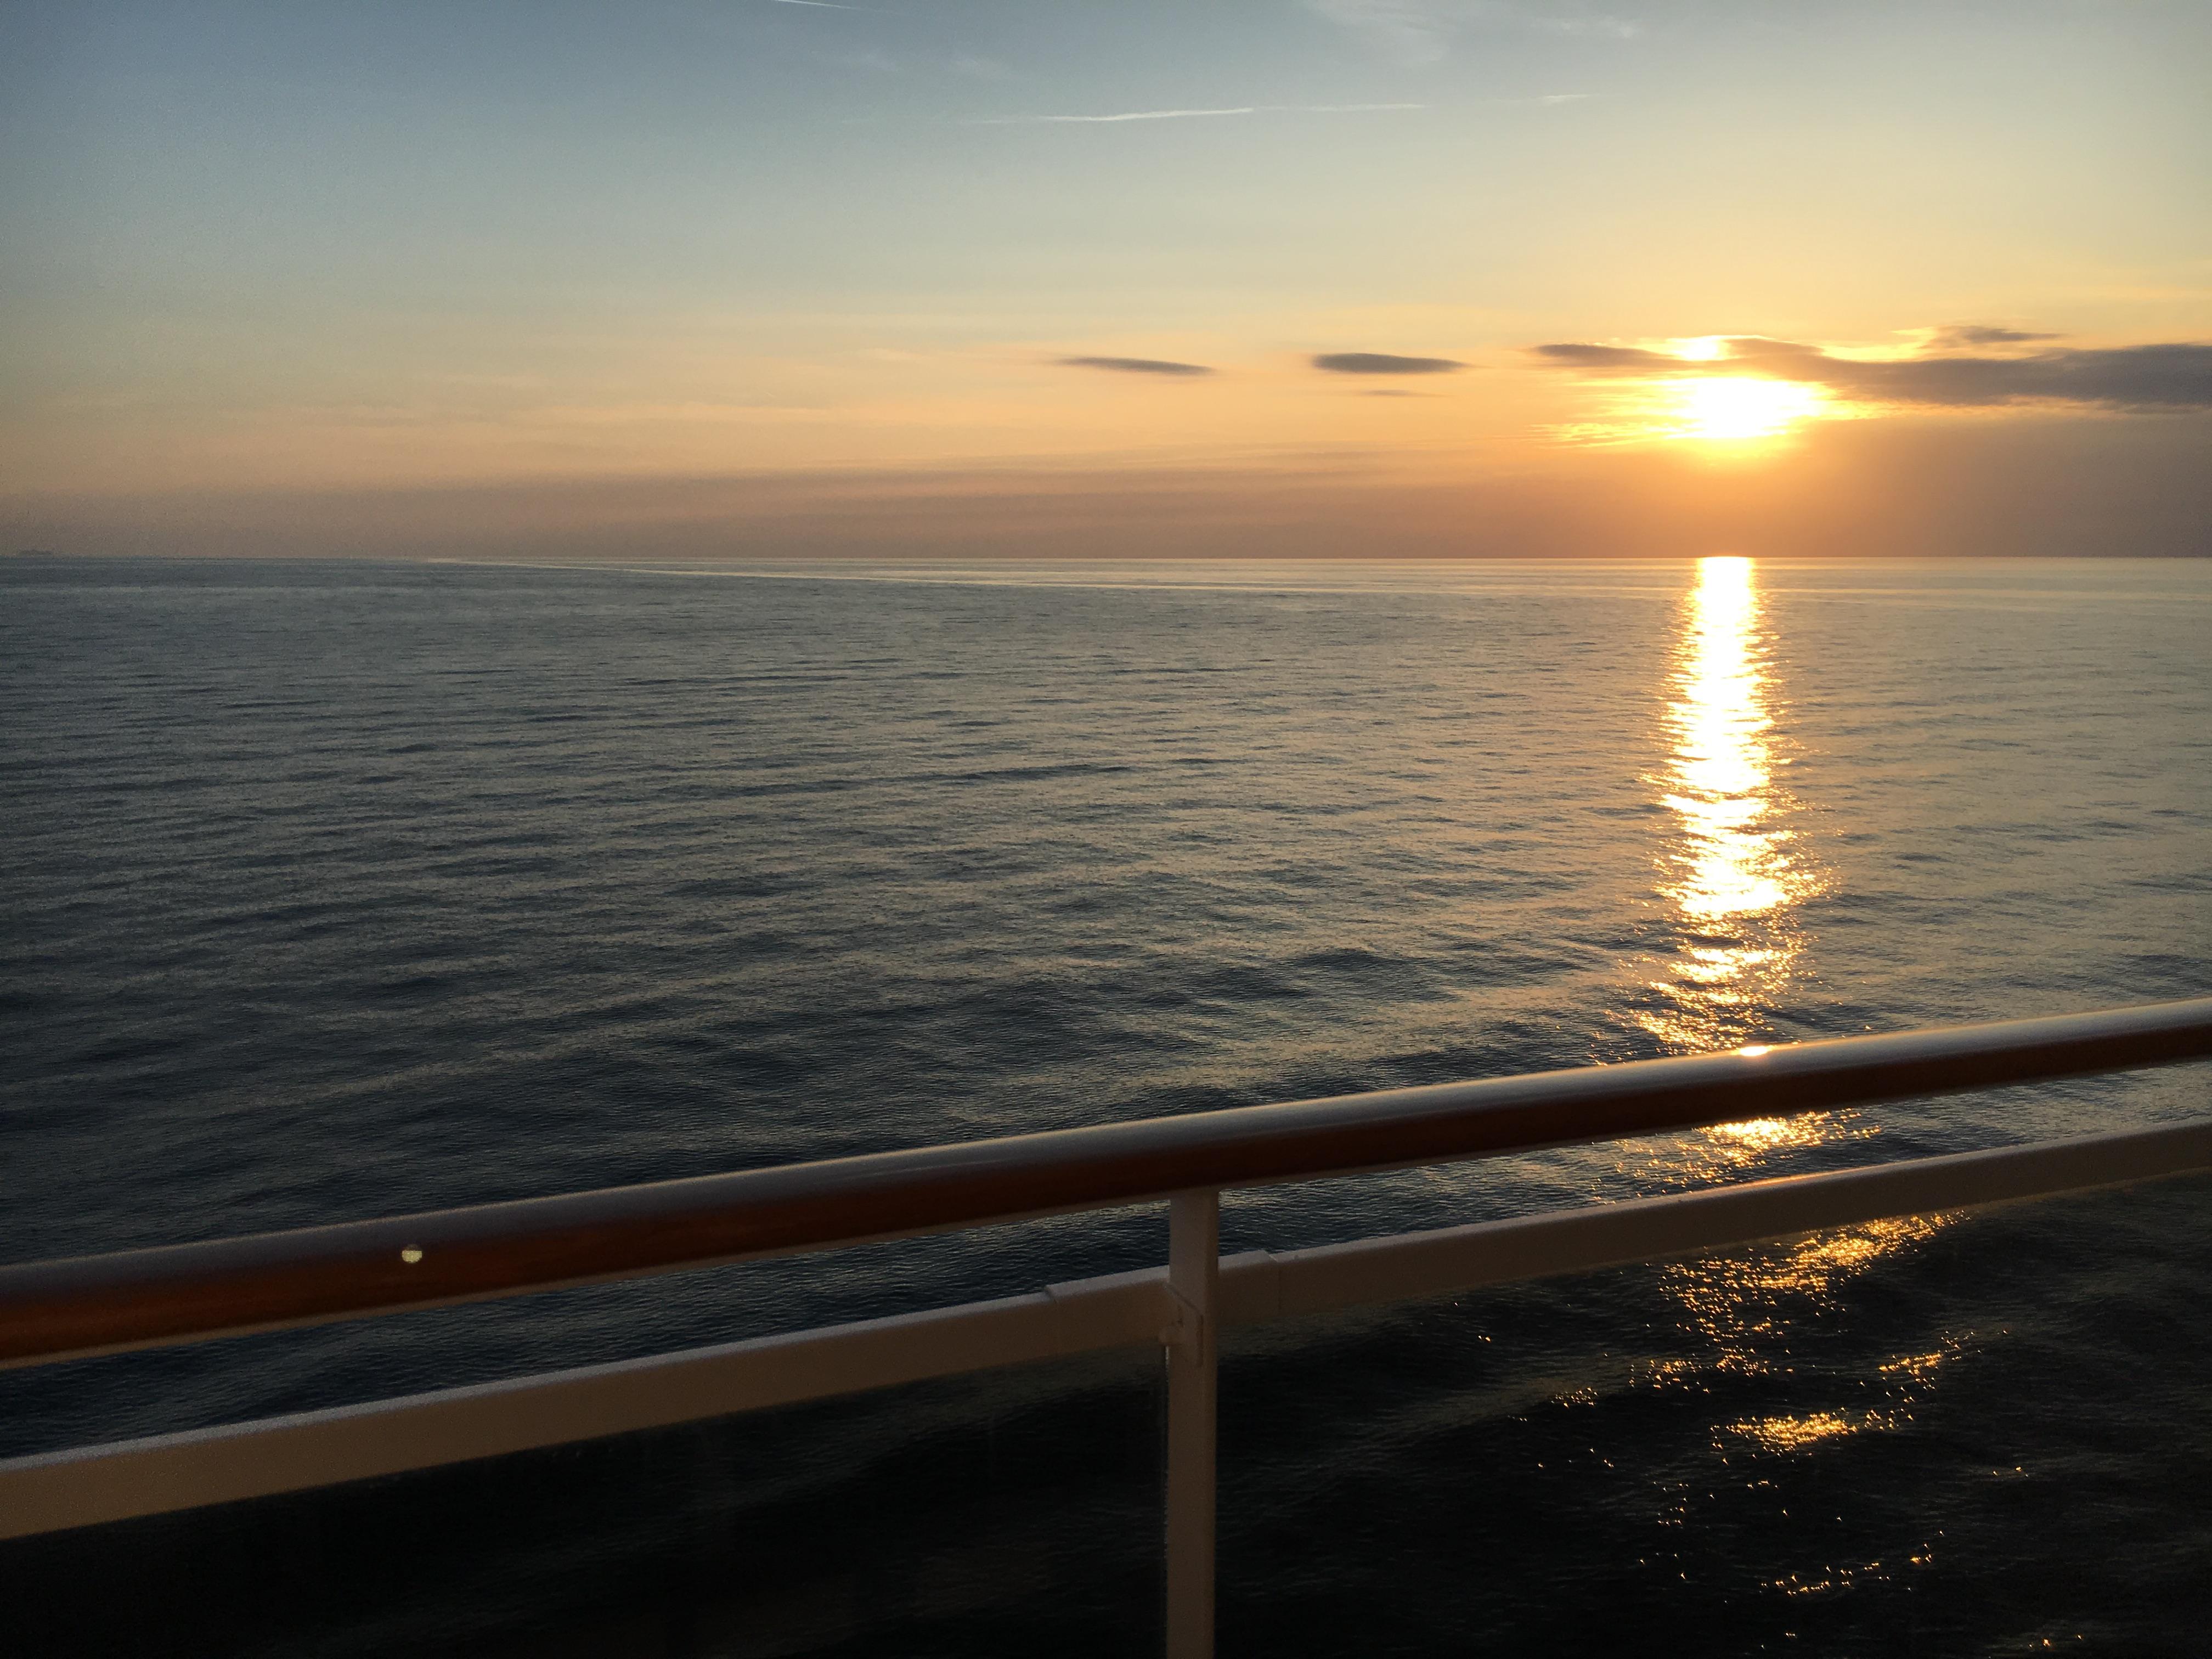 MSC Kreuzfahrt ab 487€ für 11 Tage entlang der US Atlantikküste